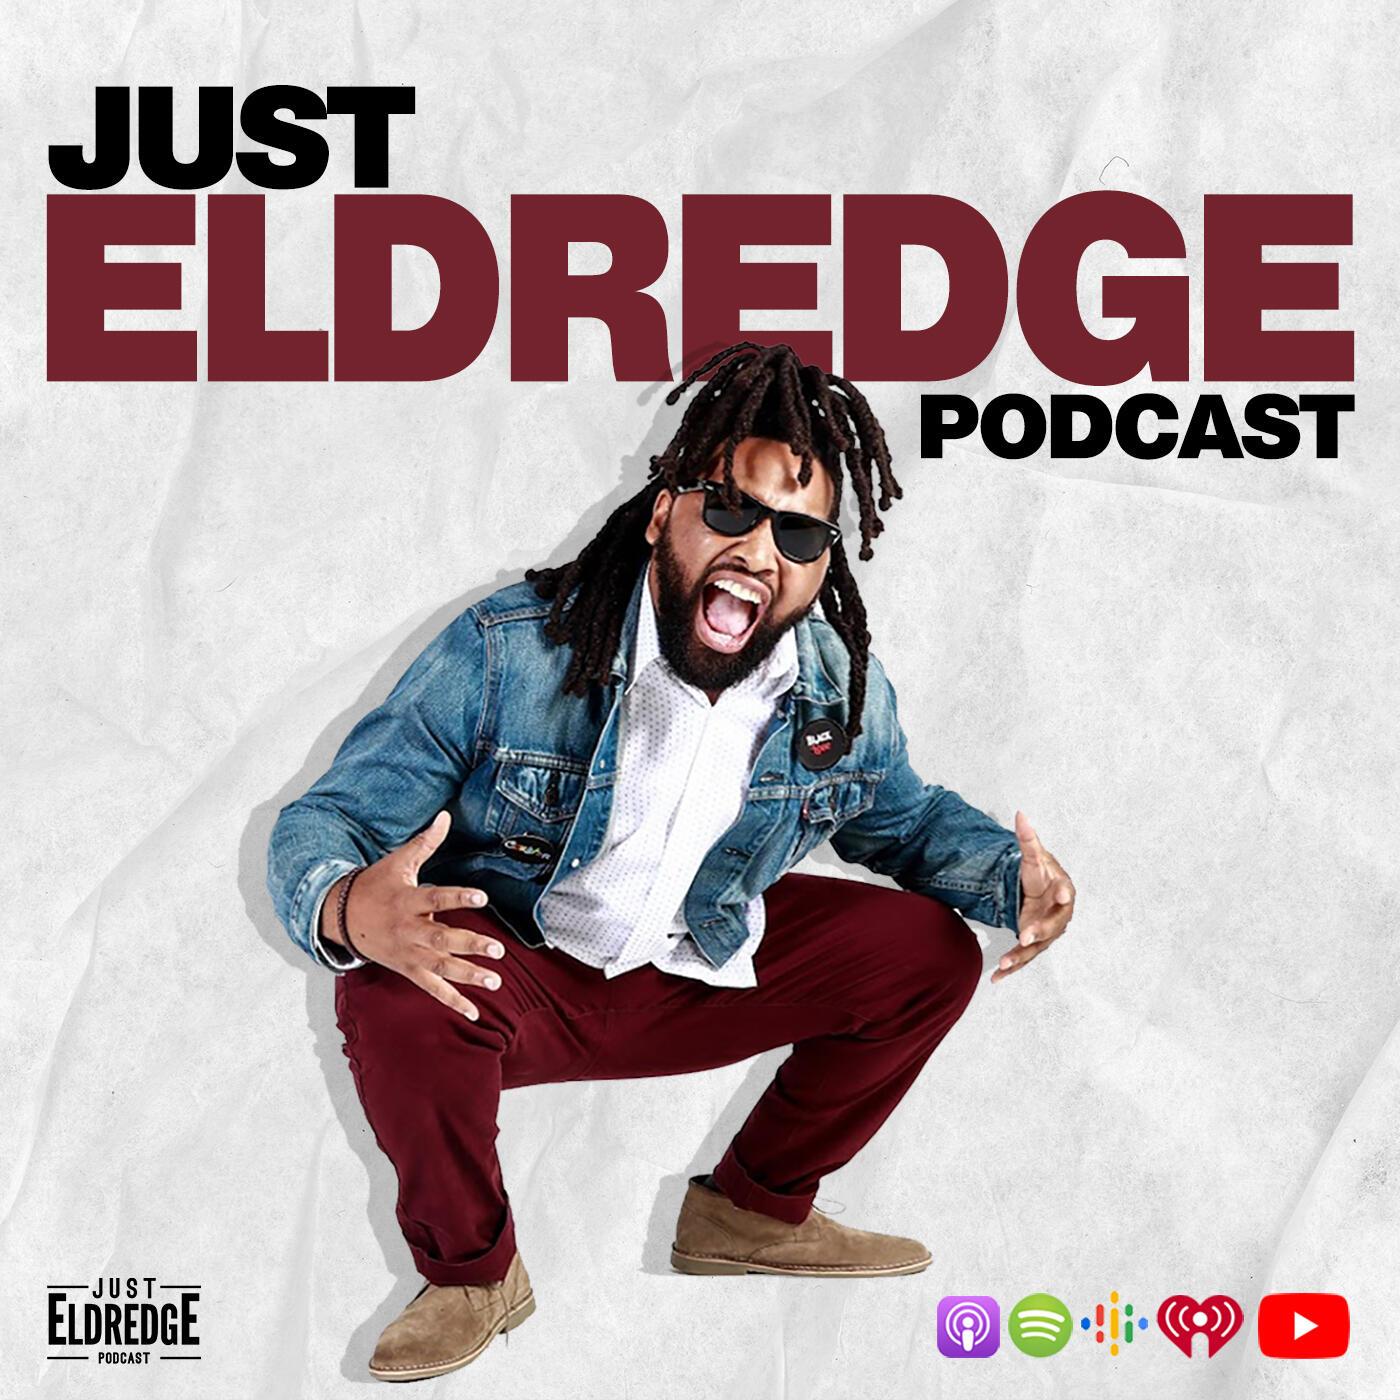 JustEldredge Podcast